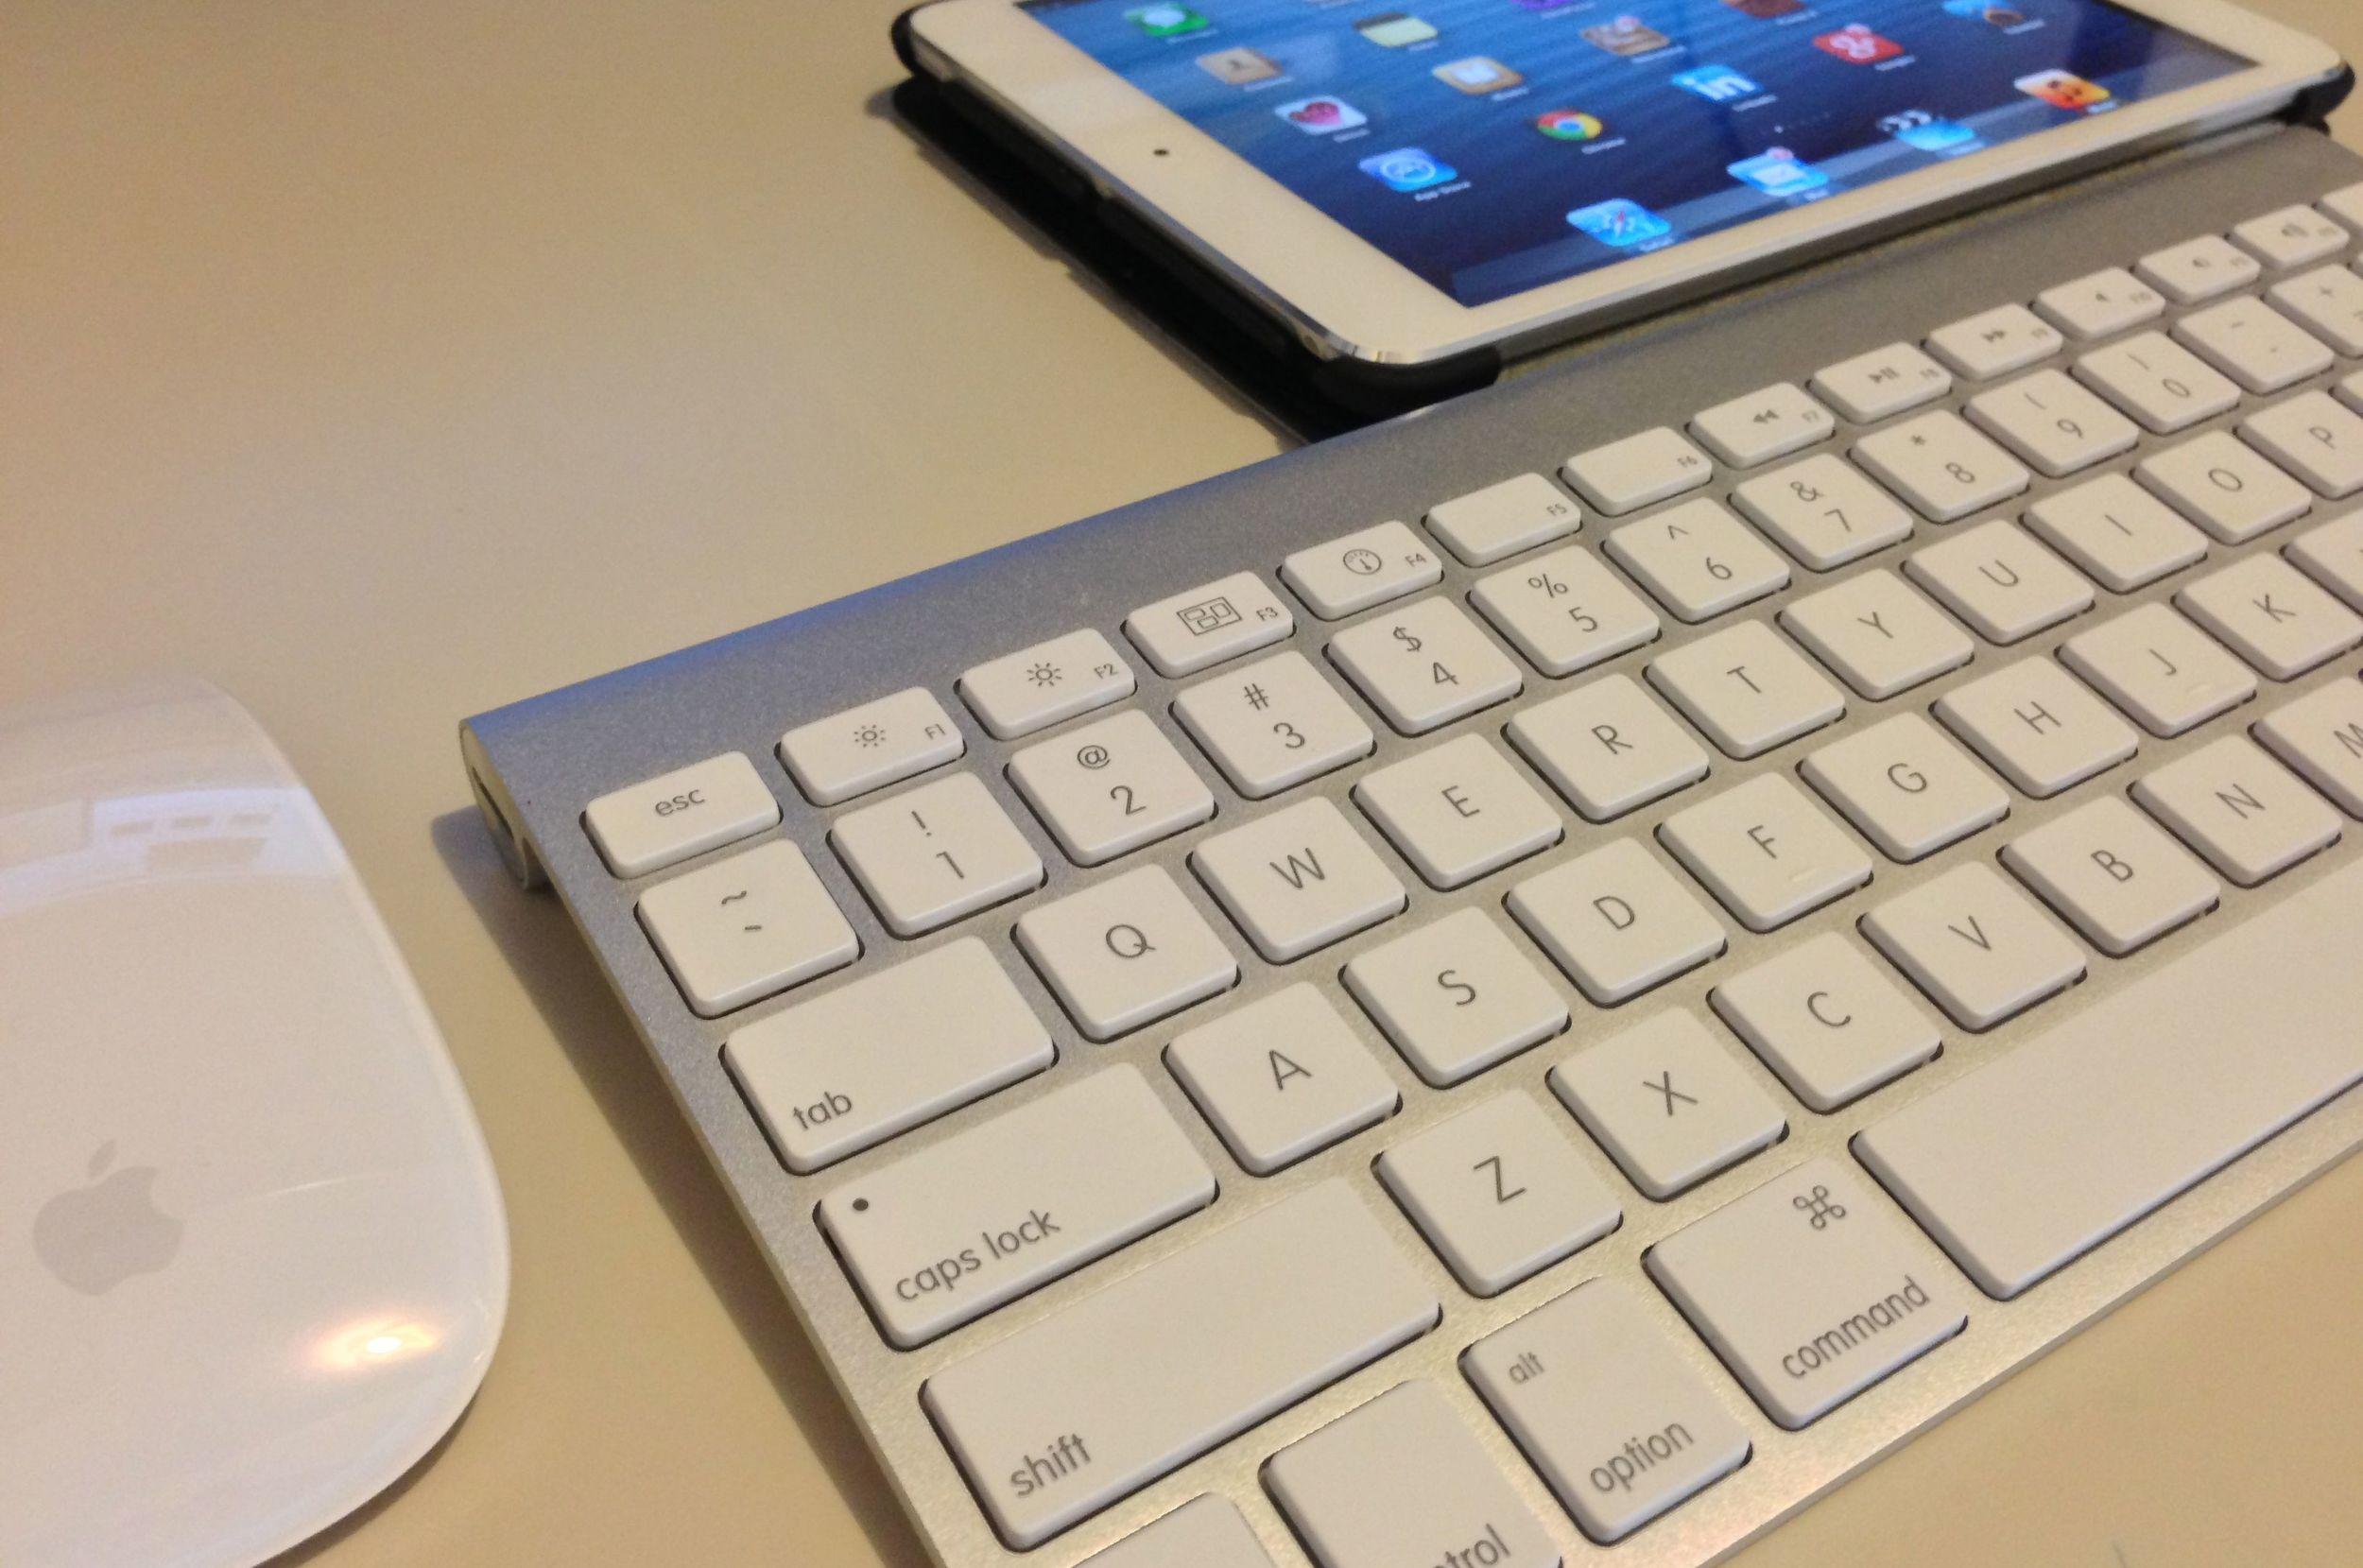 A pple Magic Mouse, wireless keyboard, and iPad mini